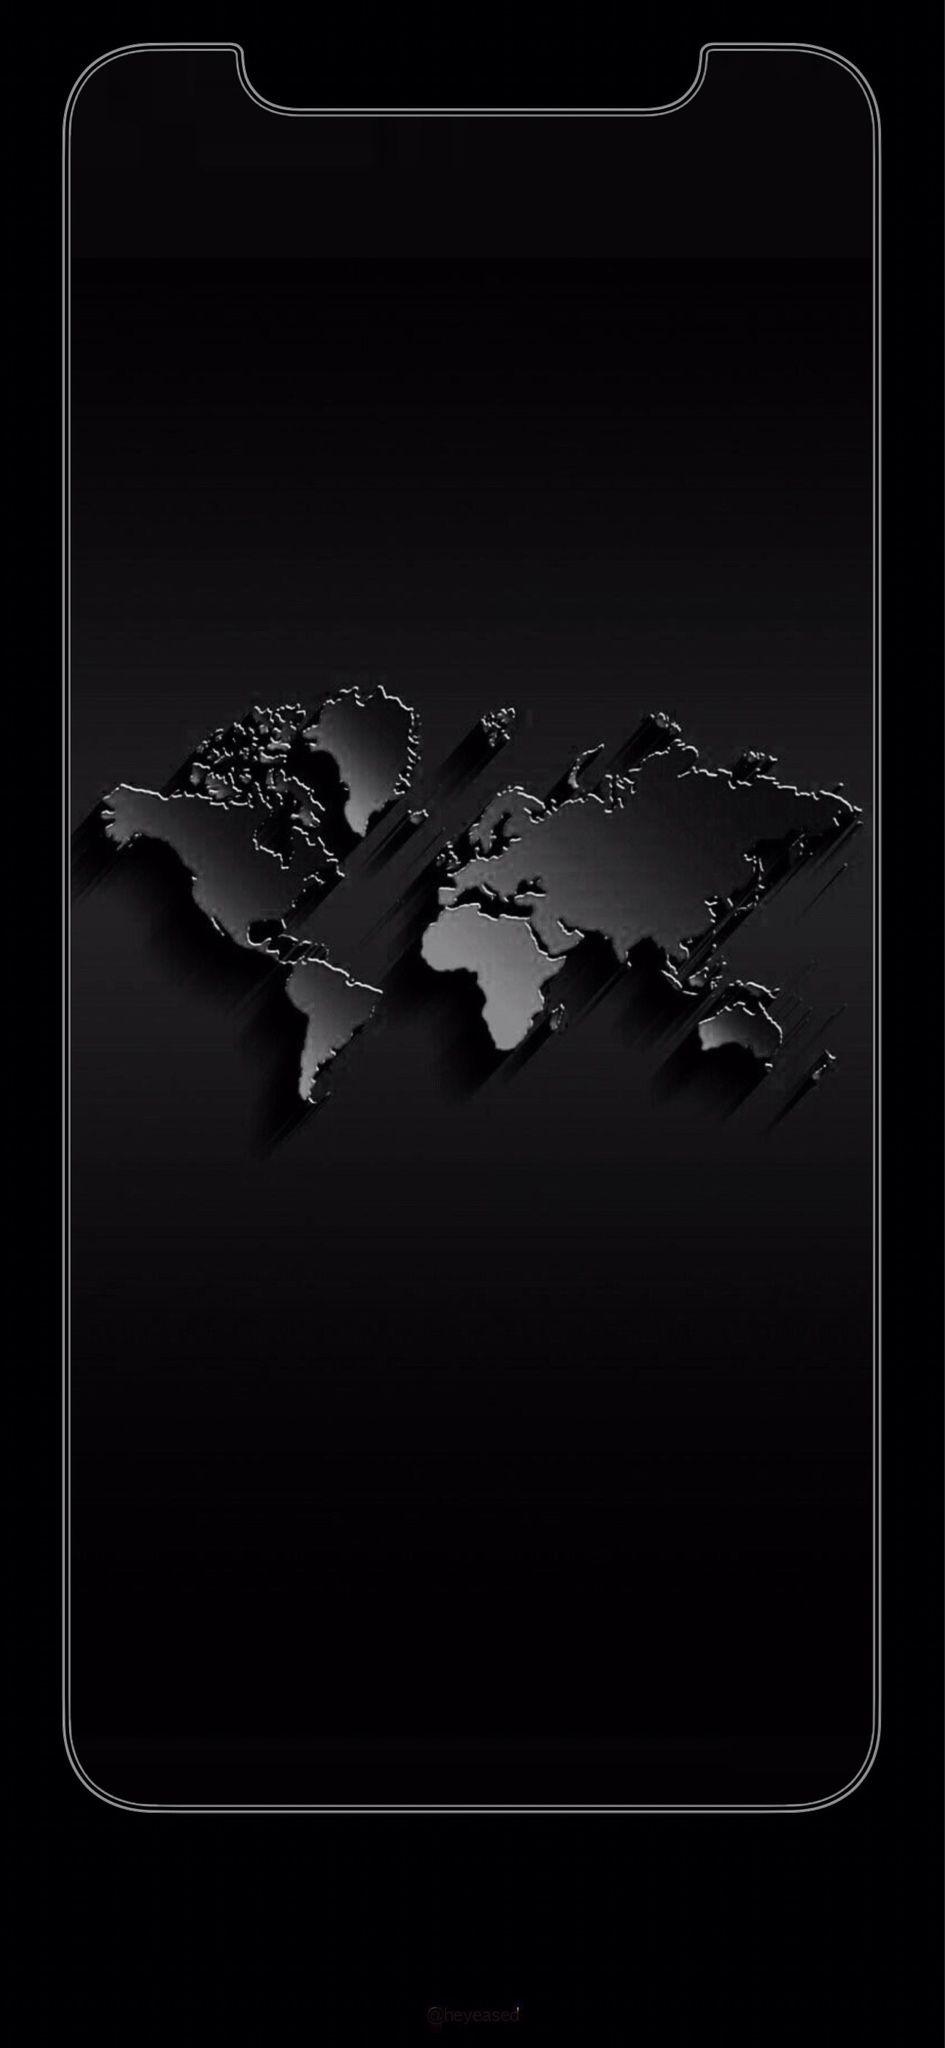 The Iphone X Wallpaper Thread Page 40 Iphone Ipad Ipod